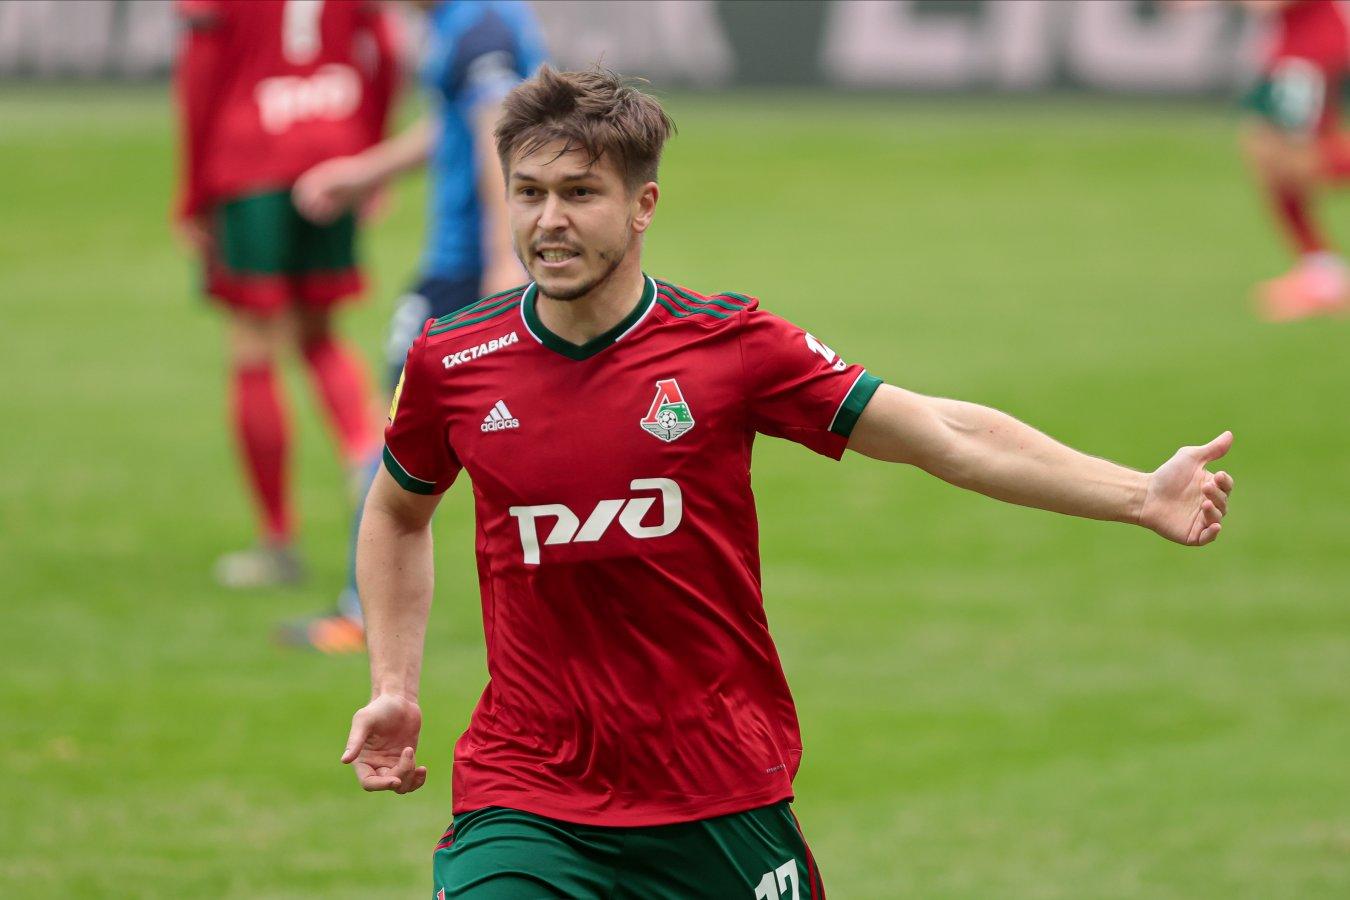 Рифат Жемалетдинов продлил контракт с Локомотивом на три года